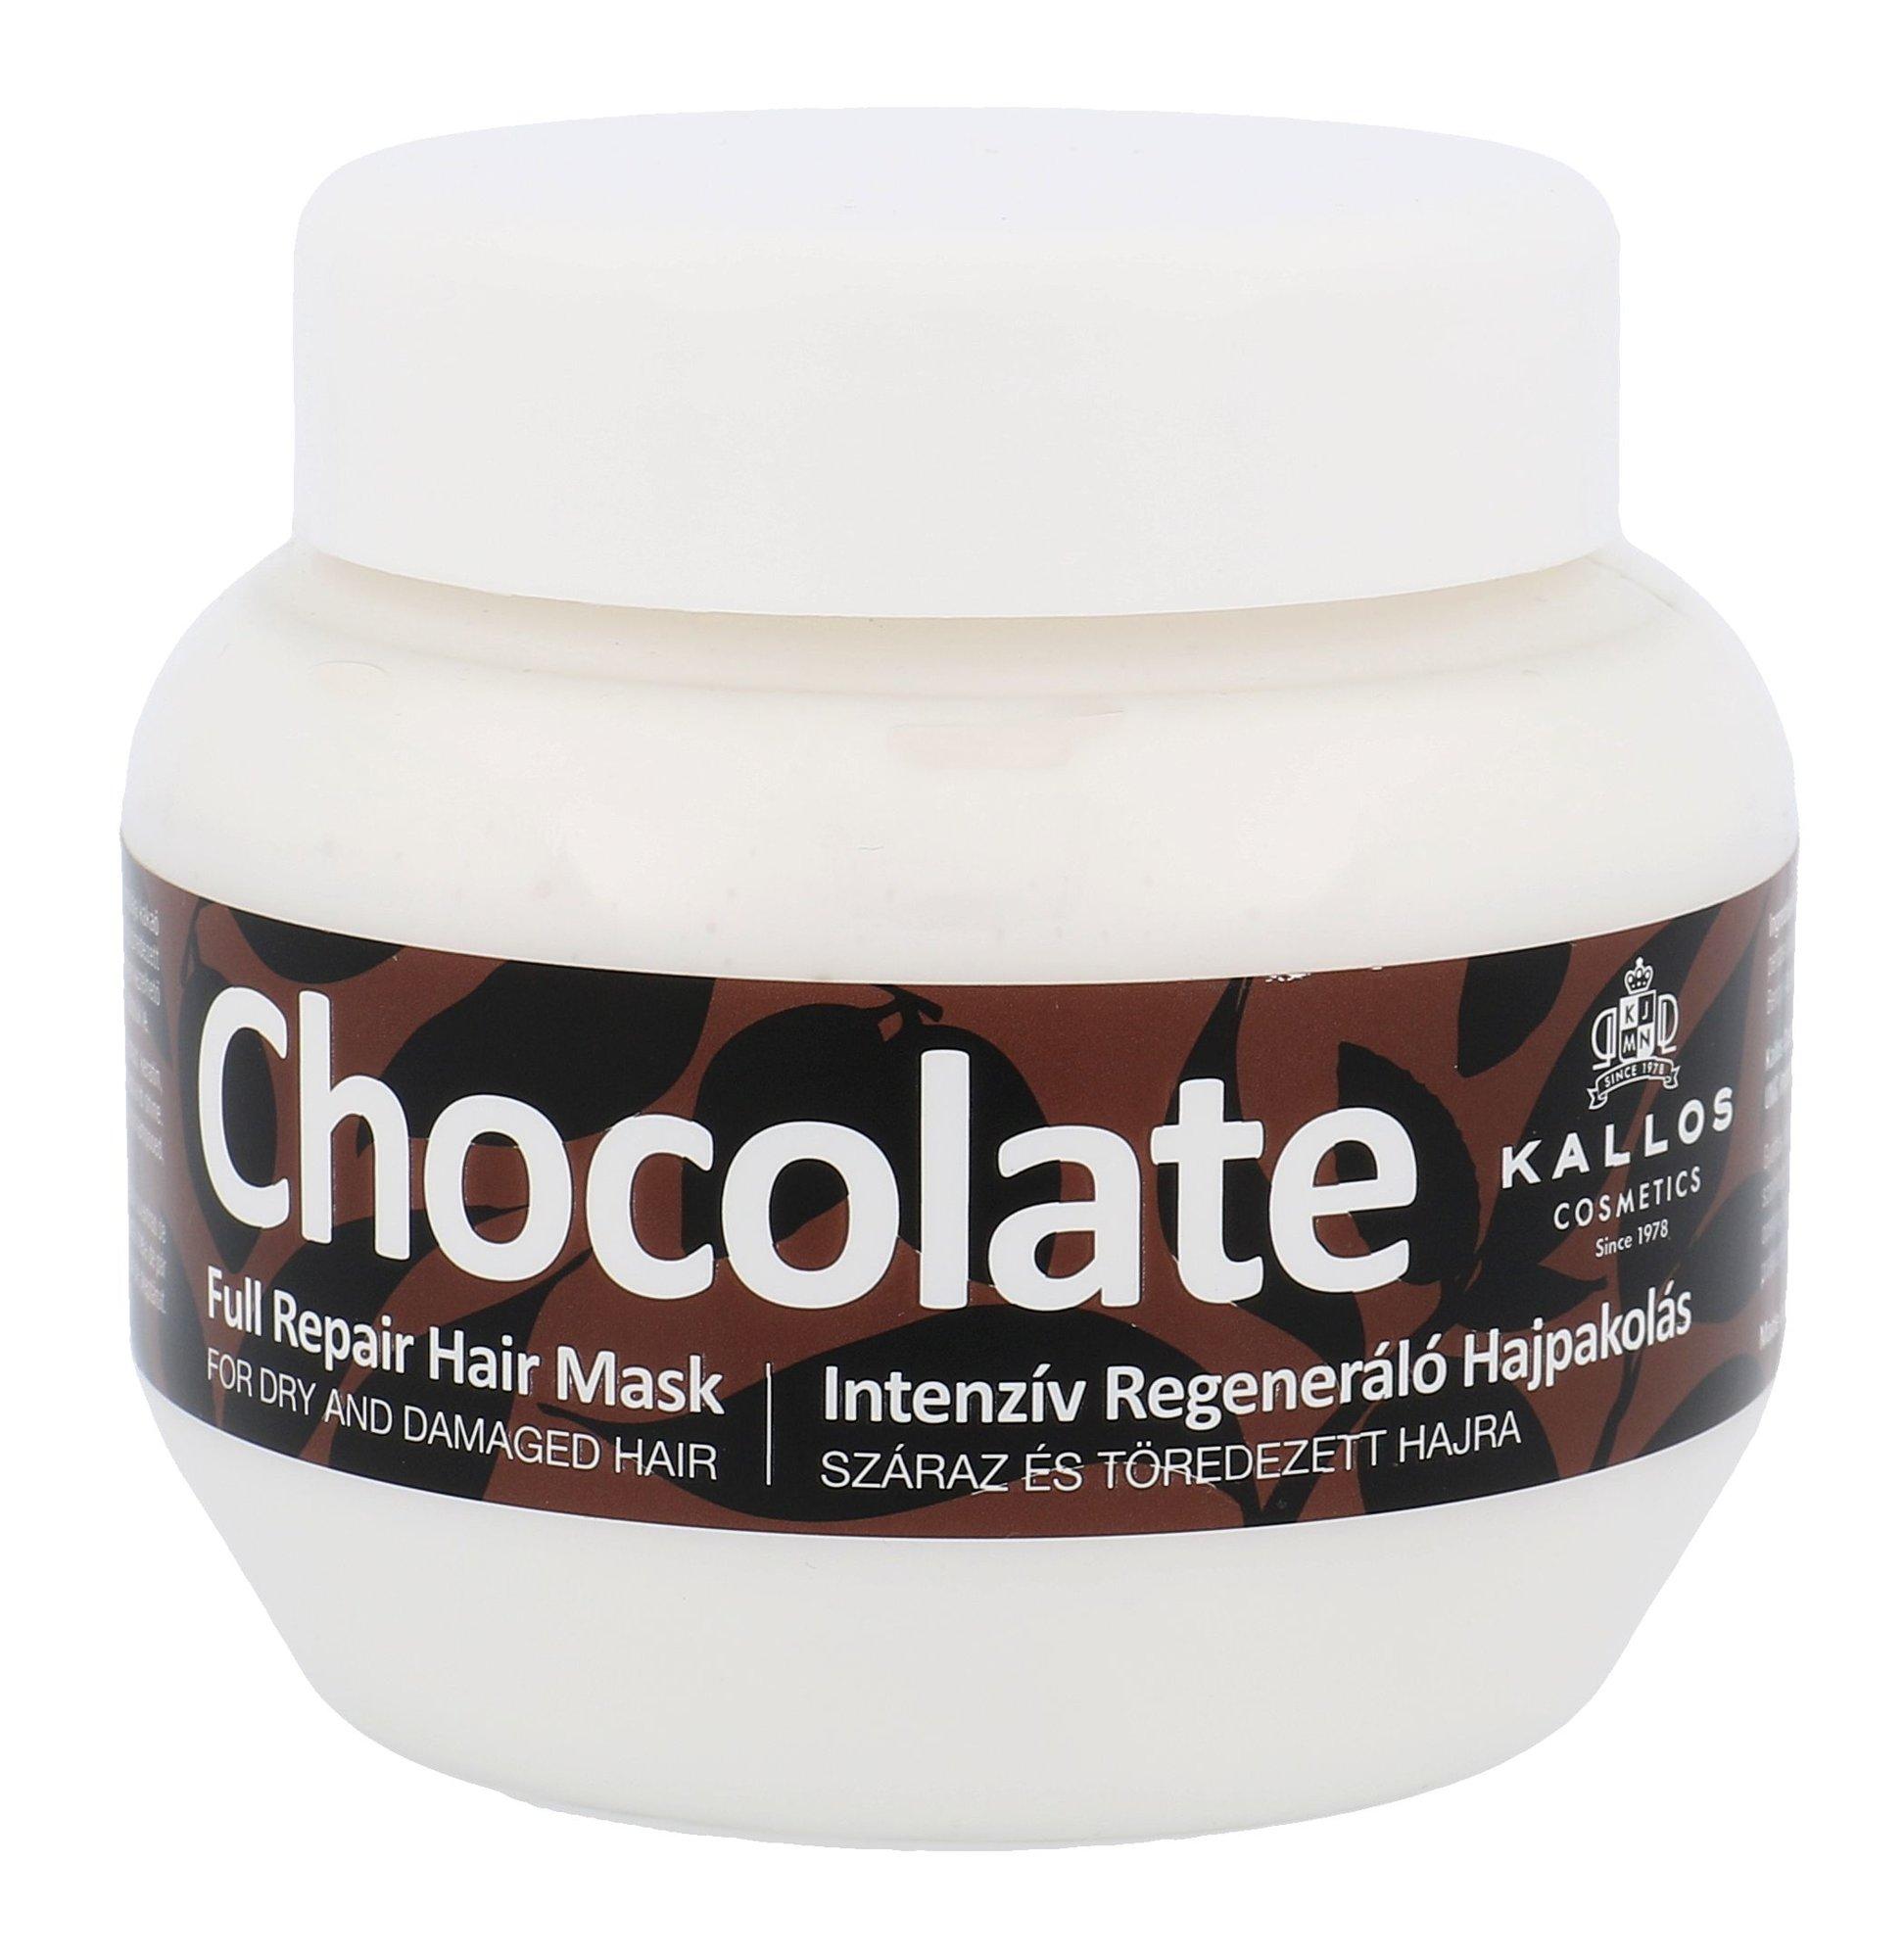 Kallos Chocolate Full Repair Hair Mask Cosmetic 275ml